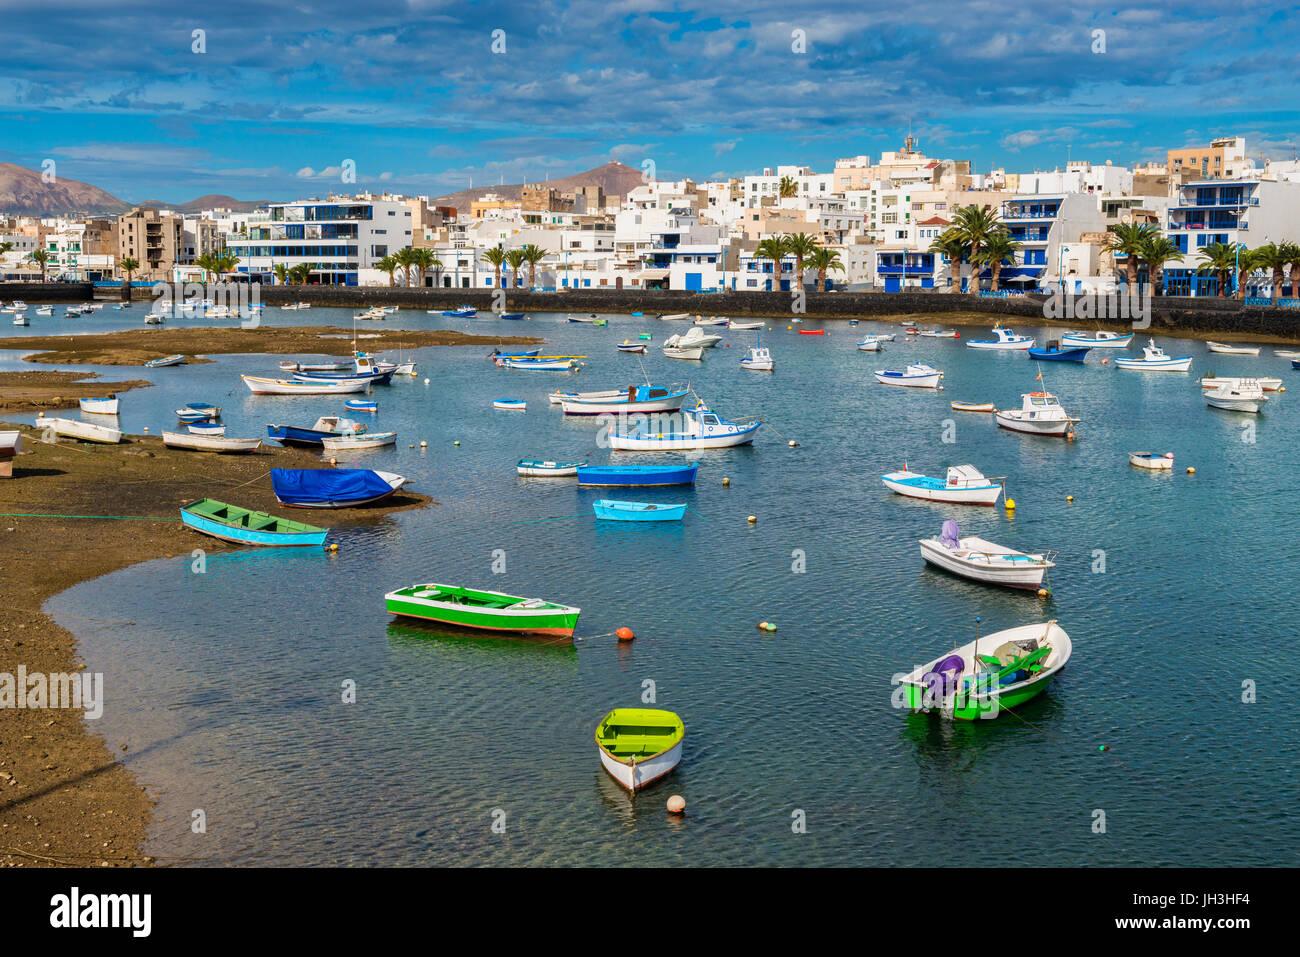 Recreational Boats in Harbor of Arrecife, Lanzarote, Canary Islands, Spain - Stock Image